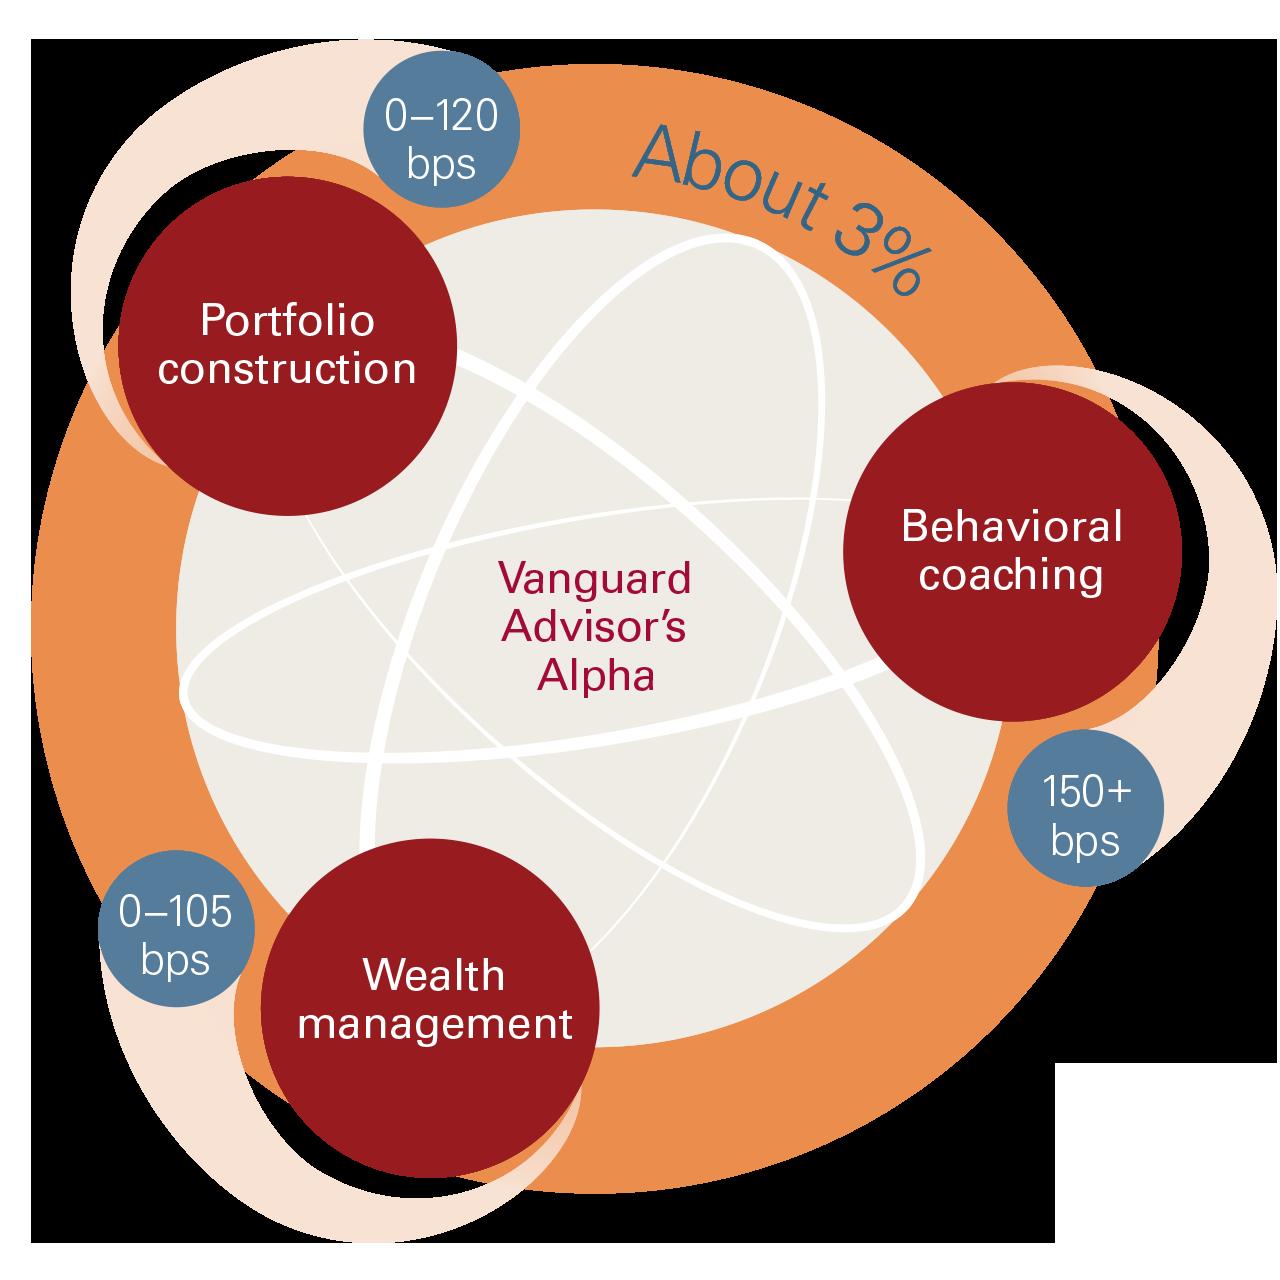 Adviser's Alpha adds about 3% through portfolio construction, behavioural coaching and wealth management